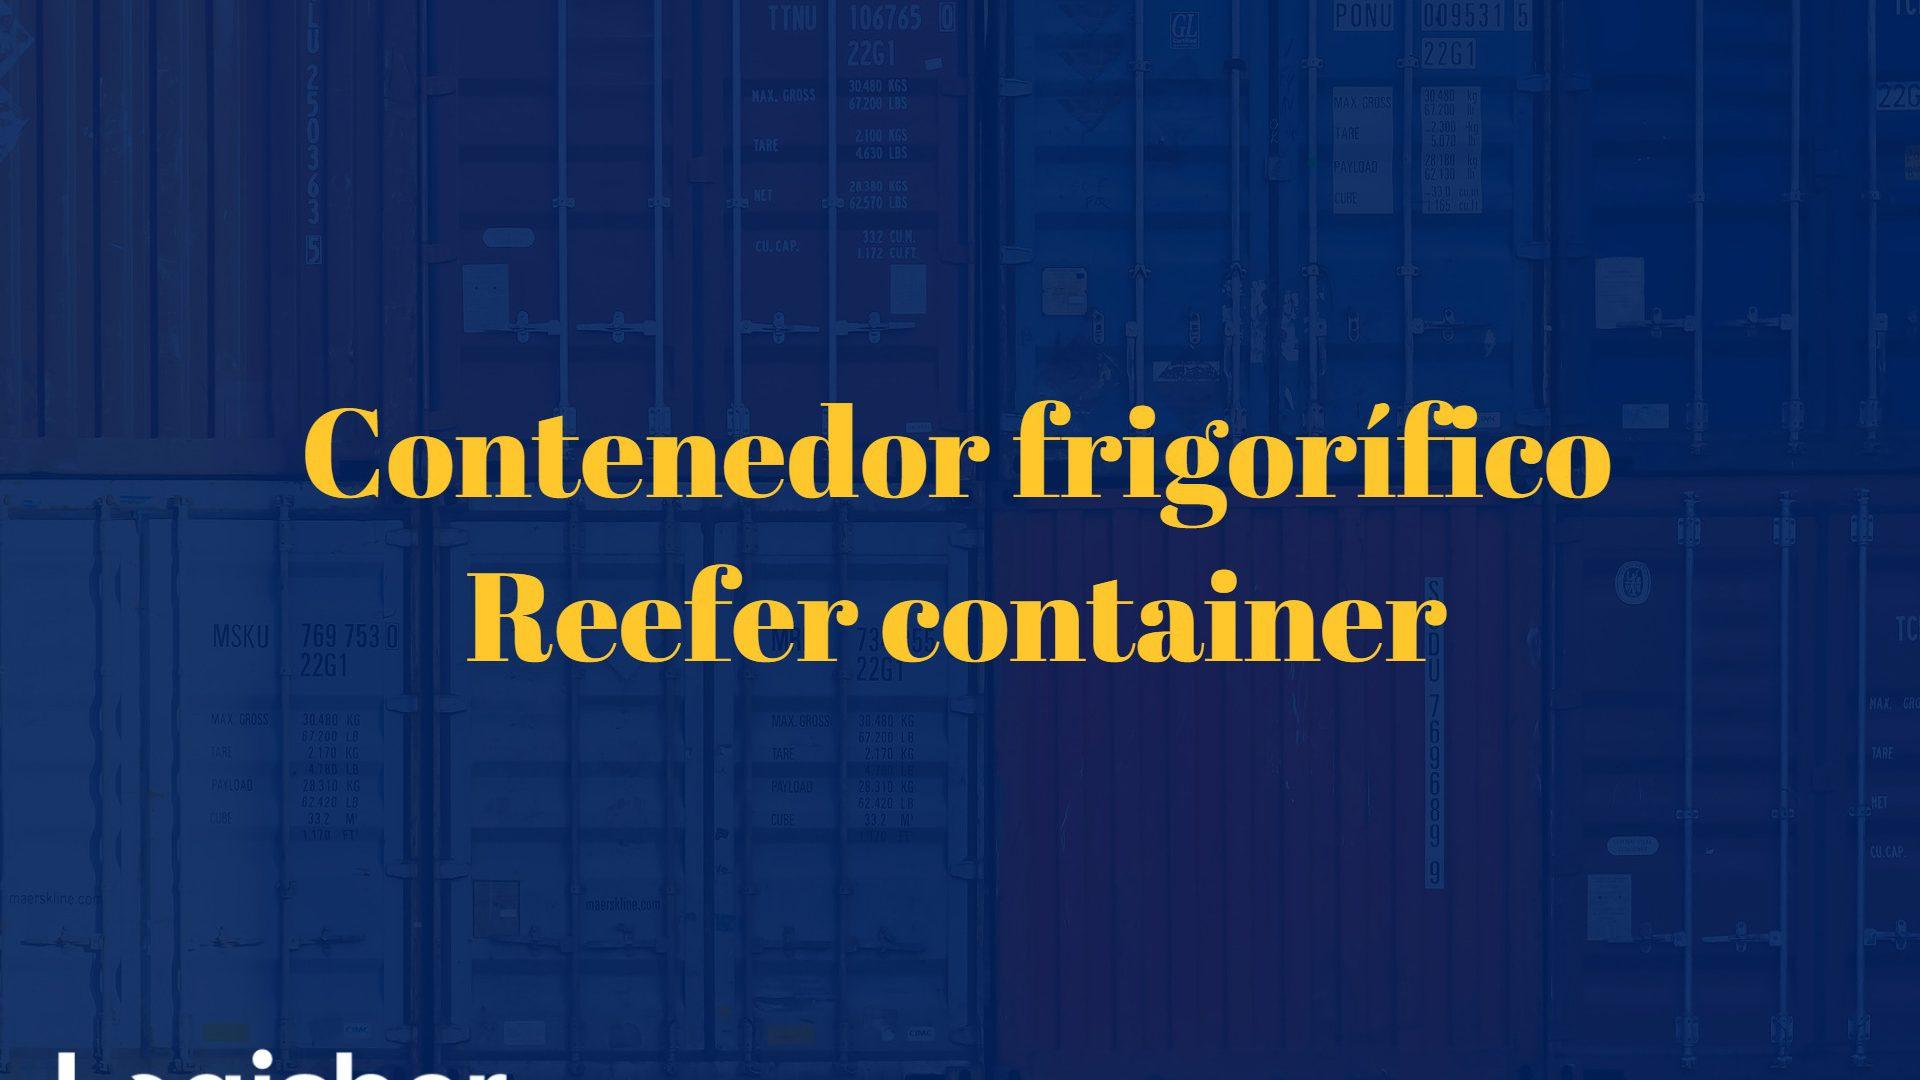 Contenedor frigorífico – reefer container